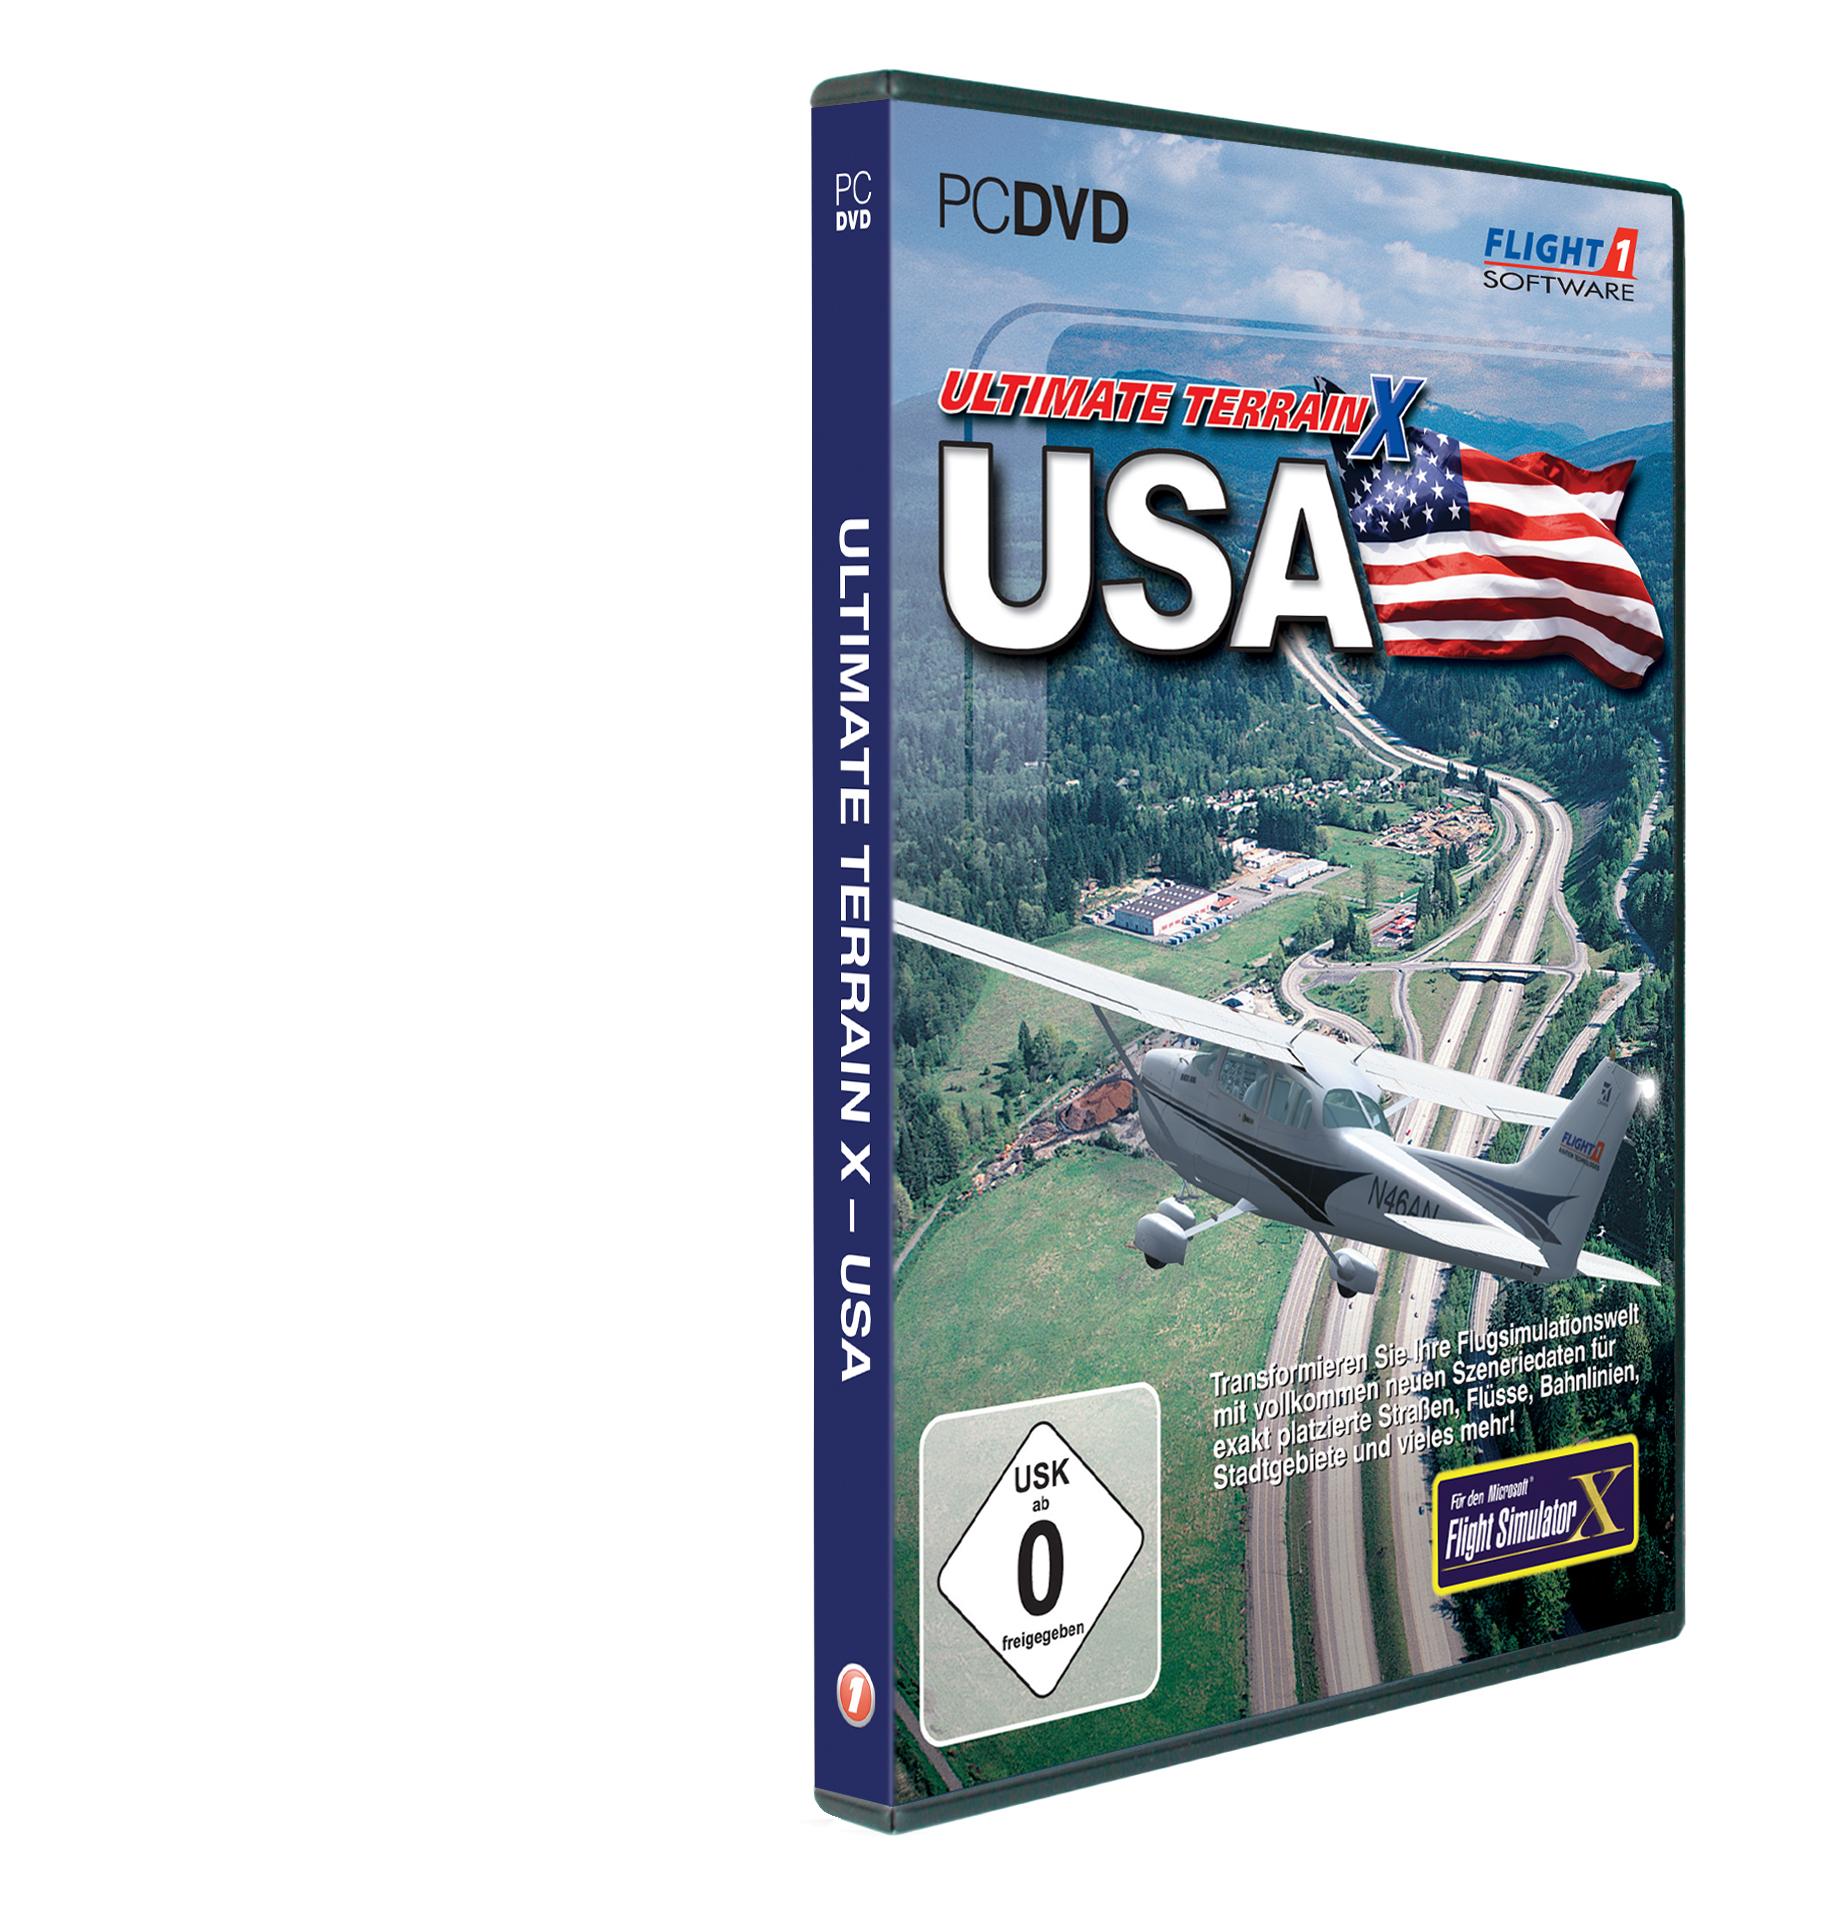 Ultimate Terrain X - USA Box